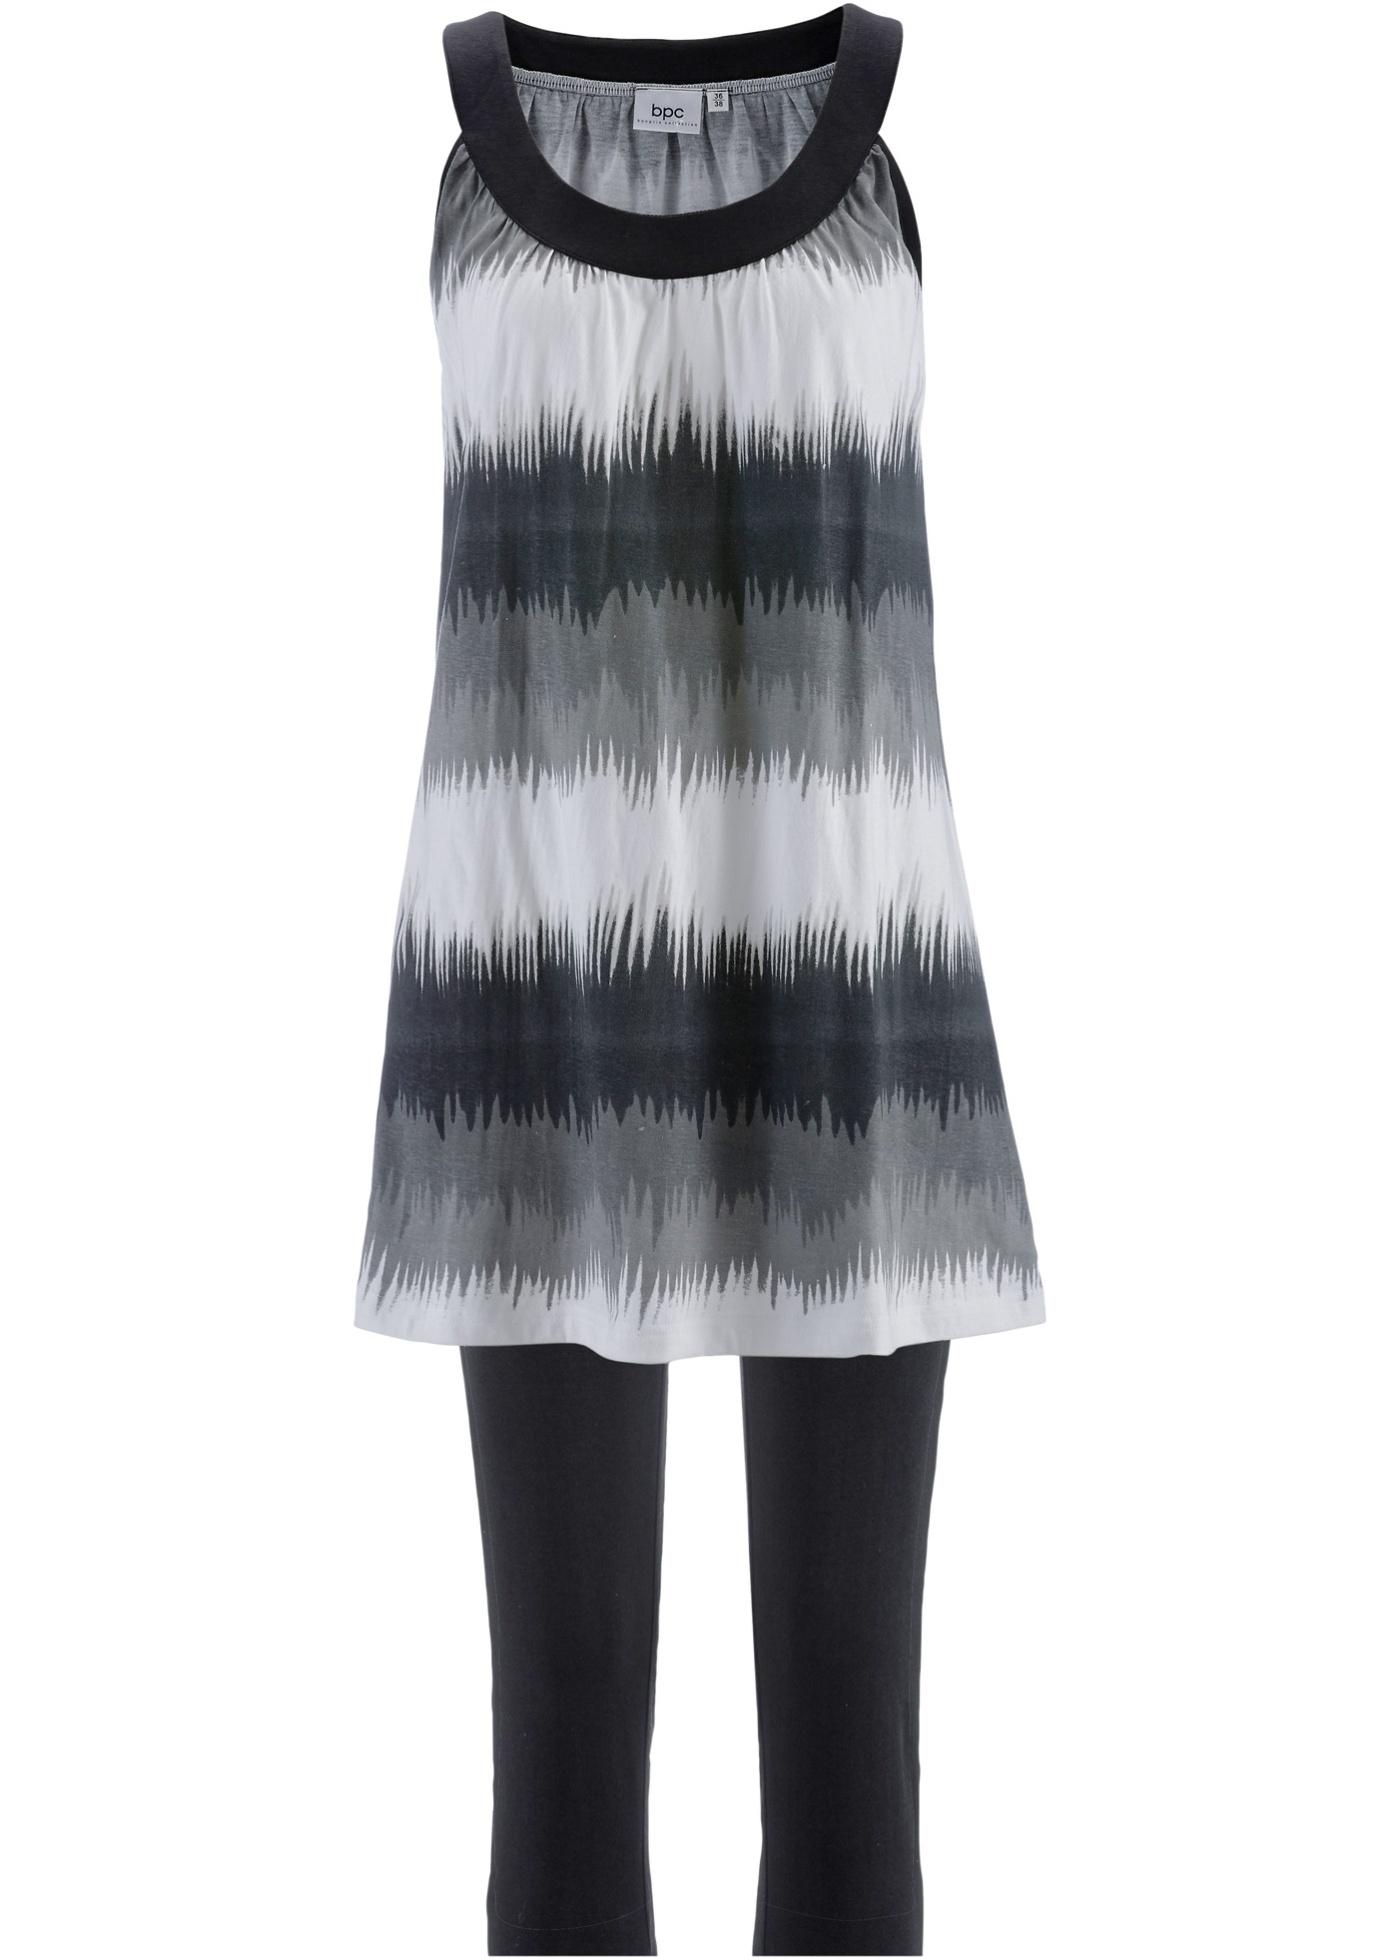 Kleid+Capri-Leggings (2-teiliges Set)